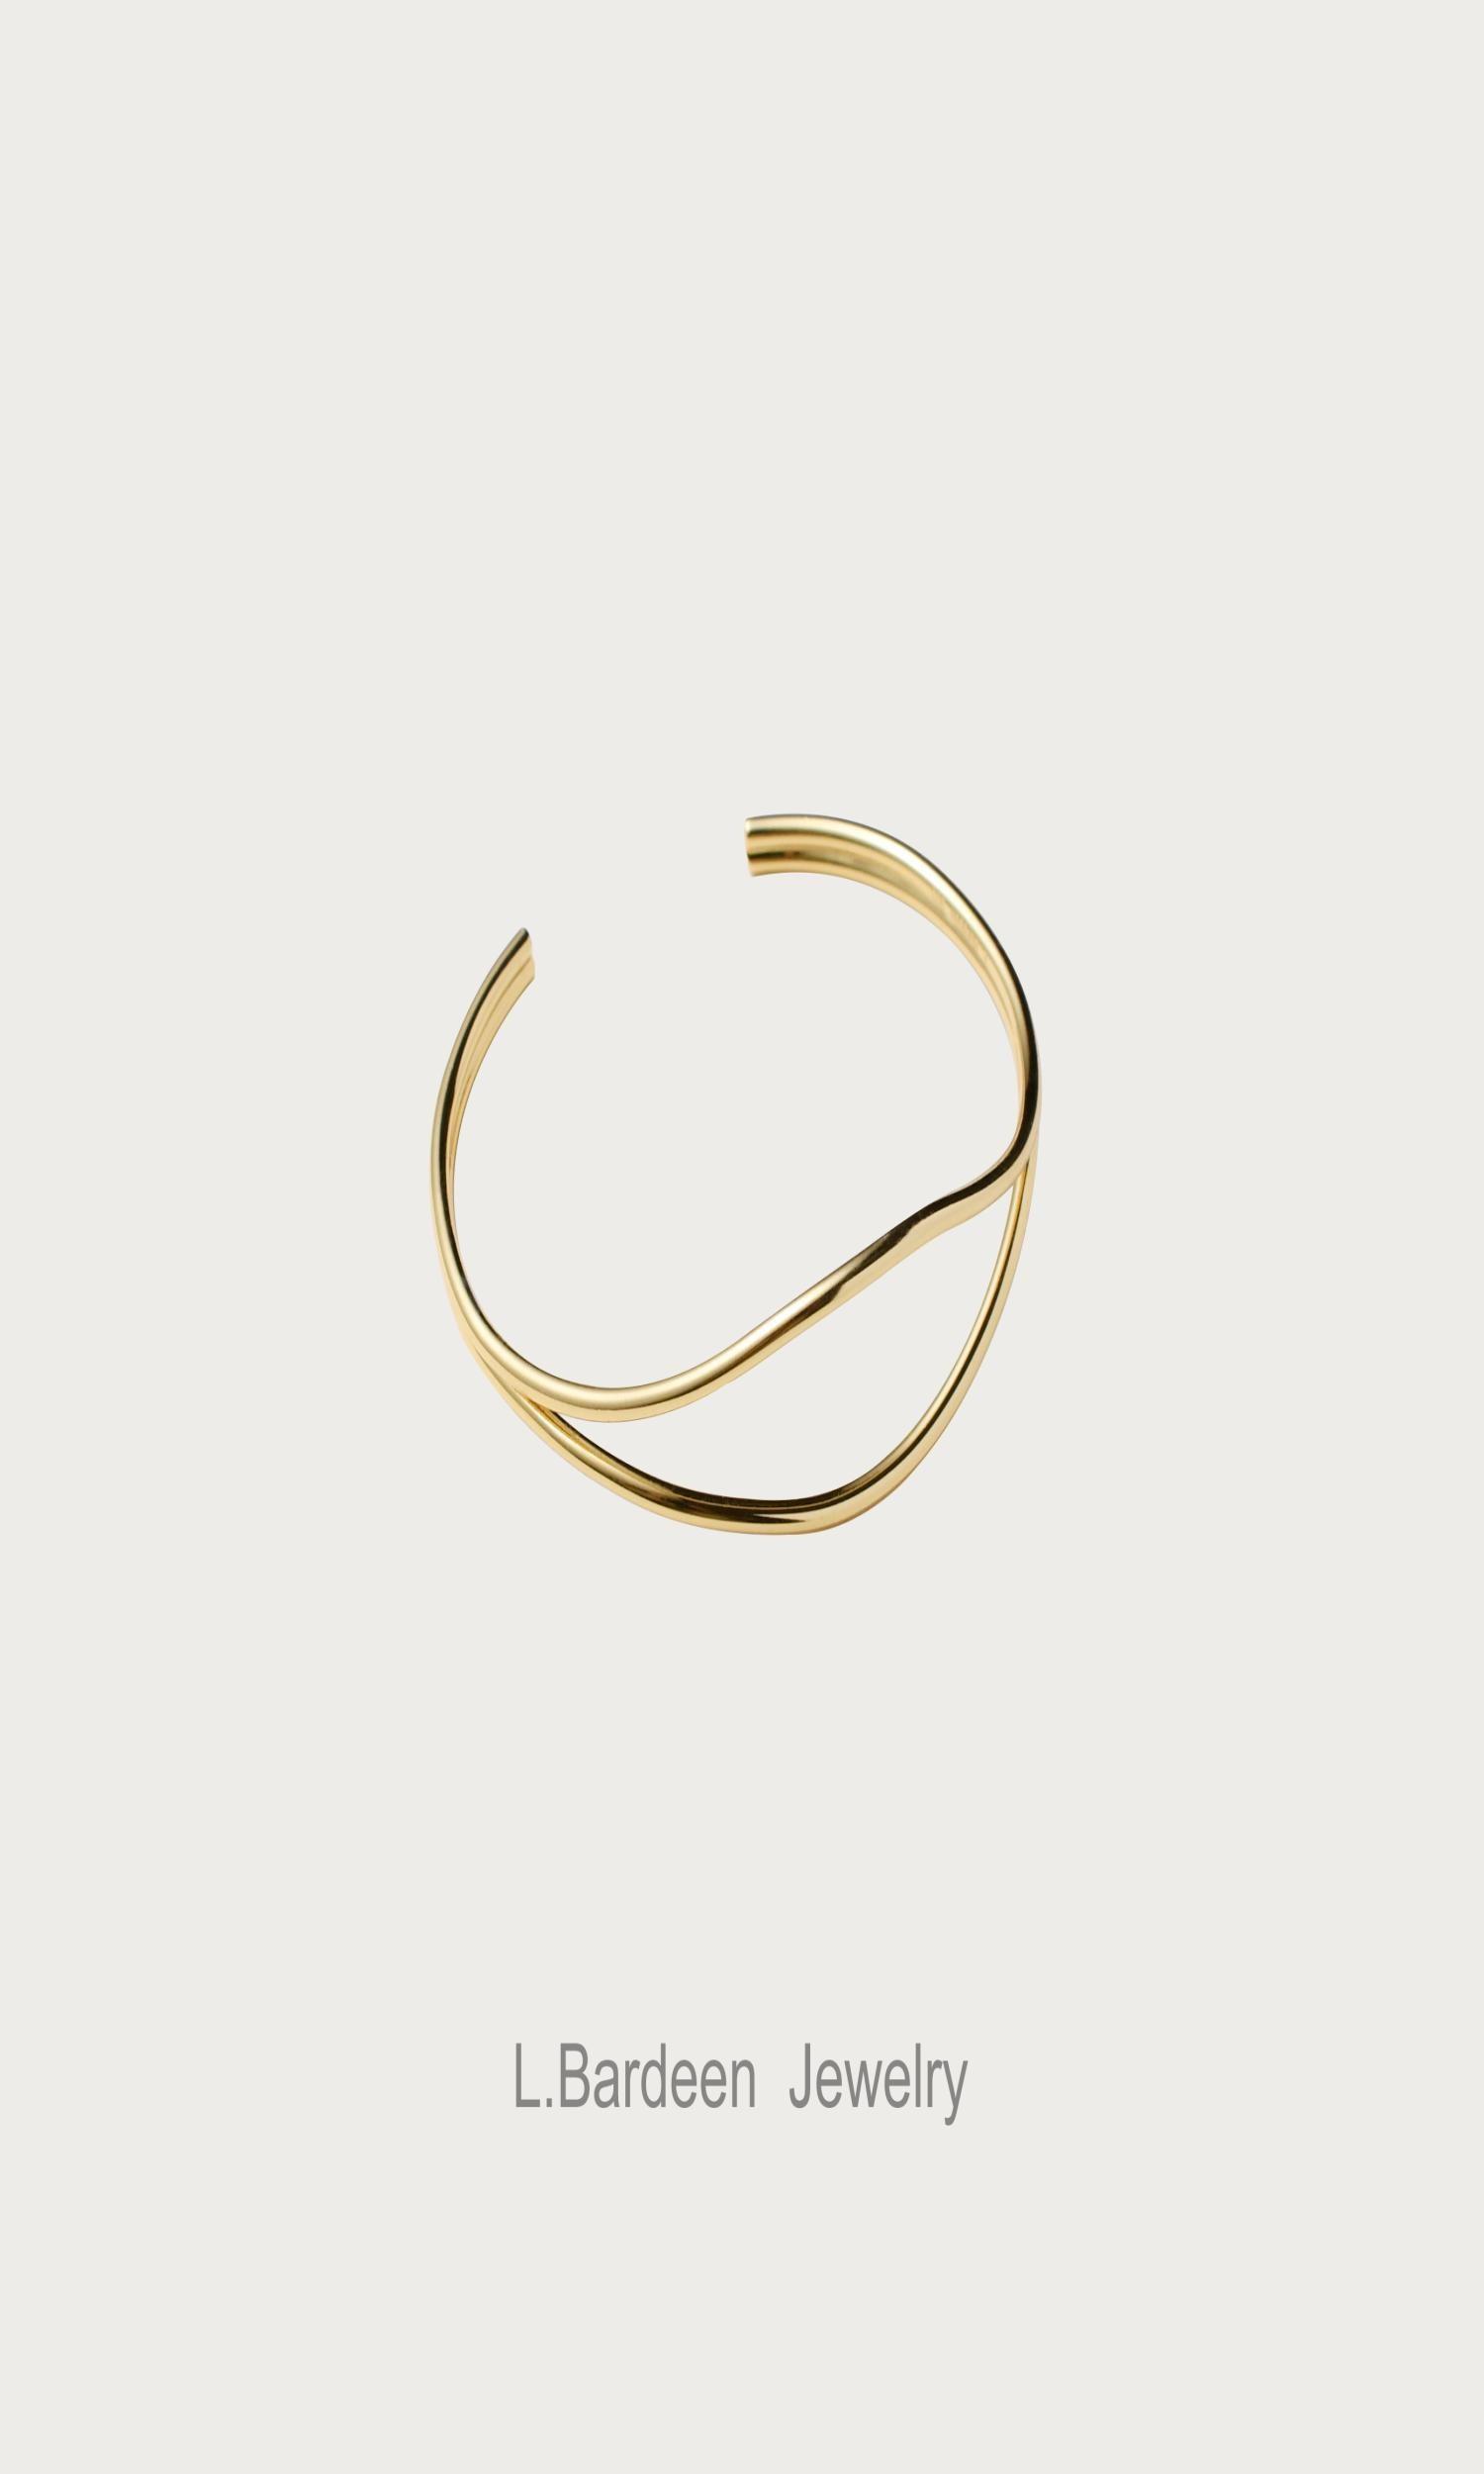 Authentic L. Bardeen silver bracelet simple Bracelet Gold temperament retro geometry original niche design